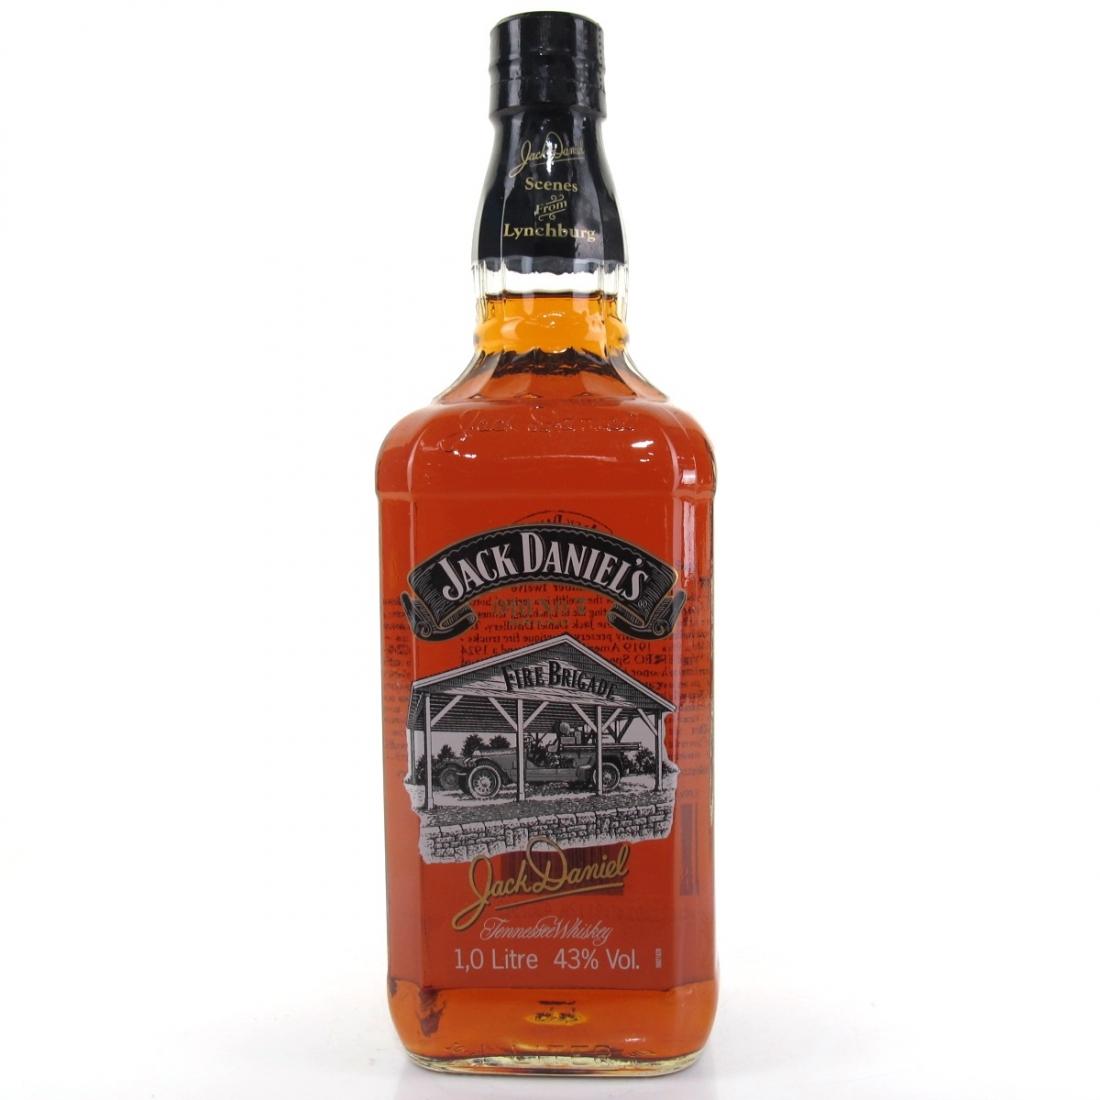 Jack Daniel's Old No.7 1 Litre / Scenes from Lynchburg #12